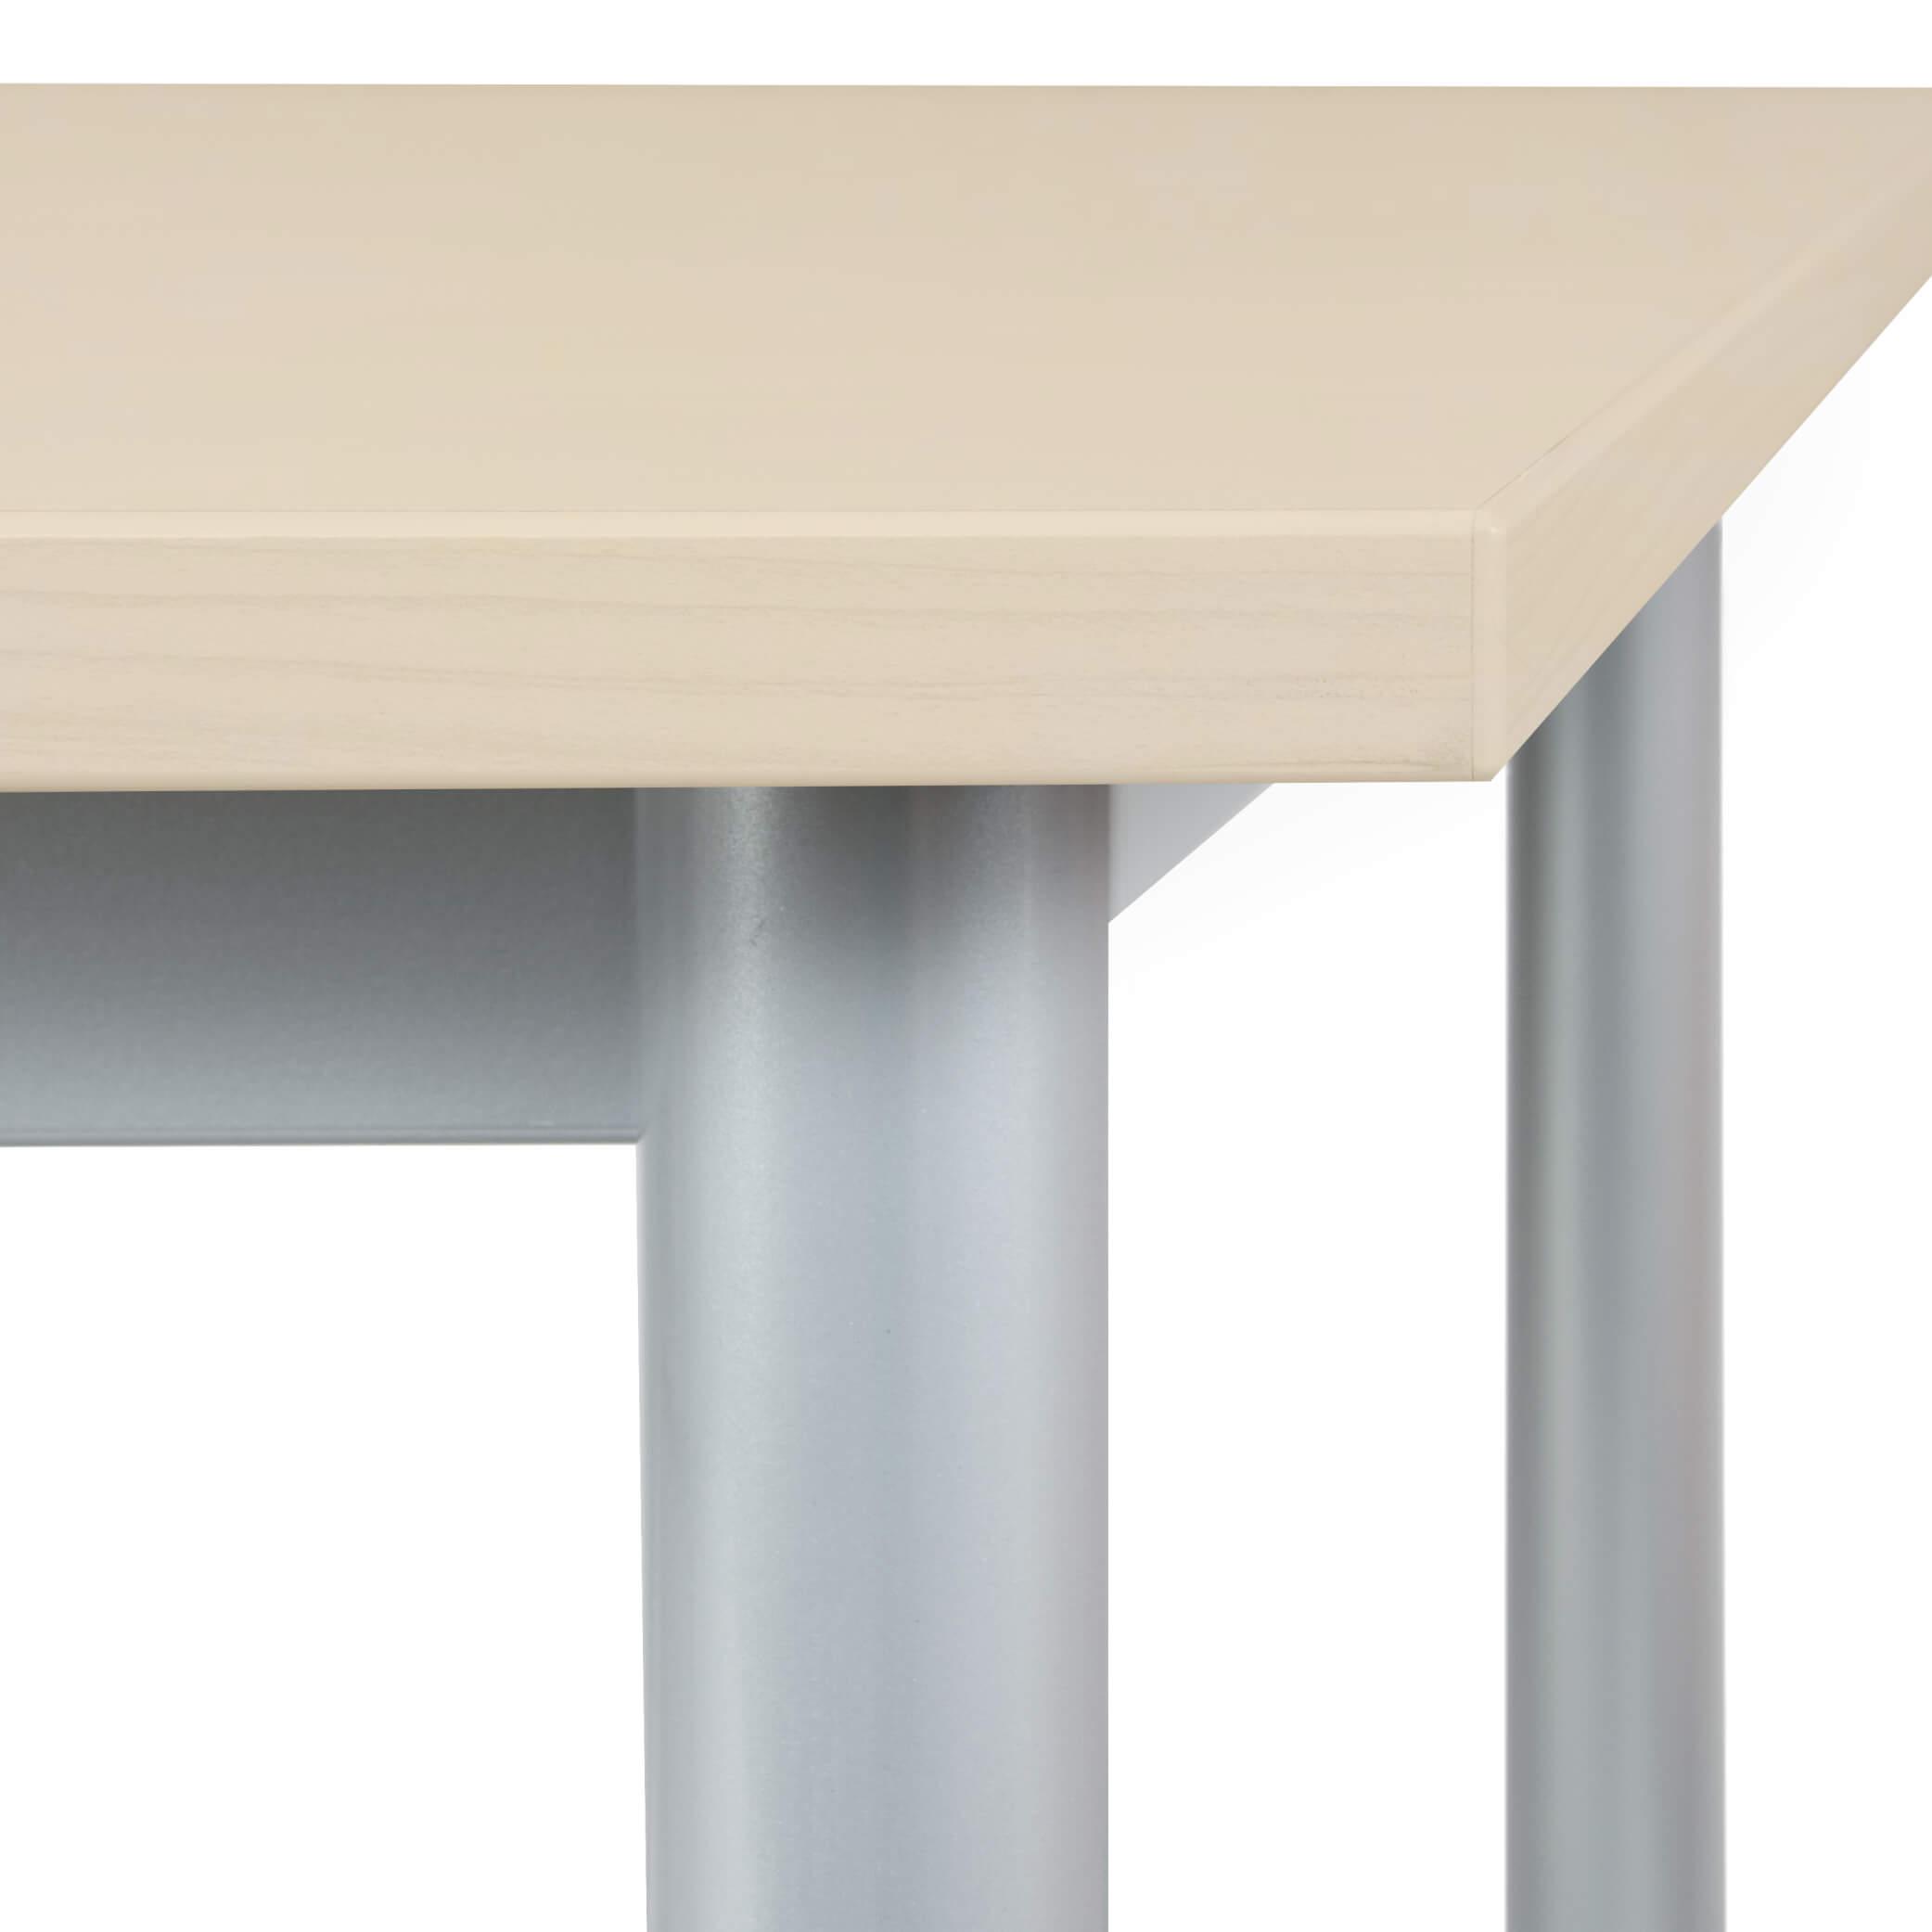 BUSINESS Schreibtisch OPTIMA G Ahorn/Silber 160 x 80cm Bürotisch Computertisch